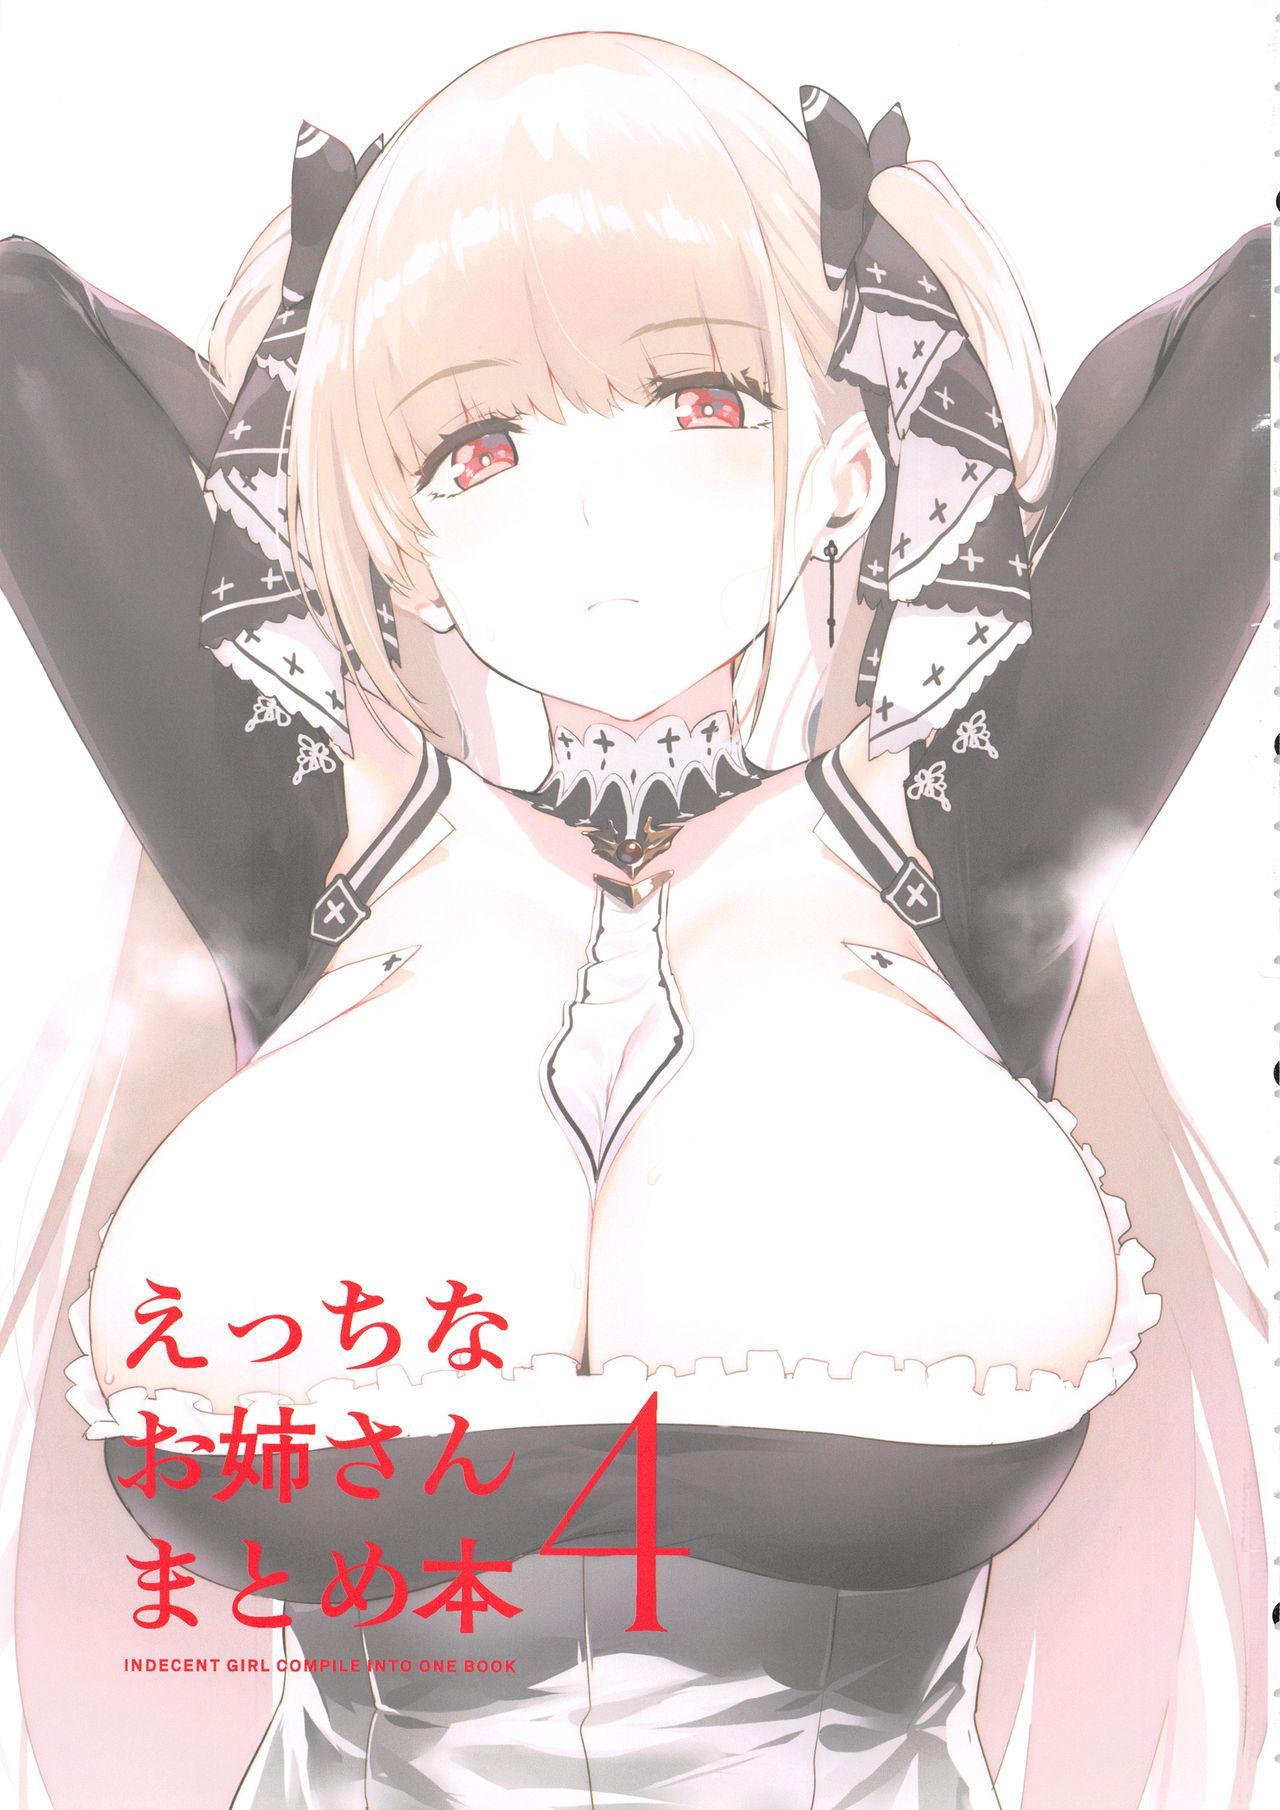 Ecchi na Onee-san Matome Hon 4 2